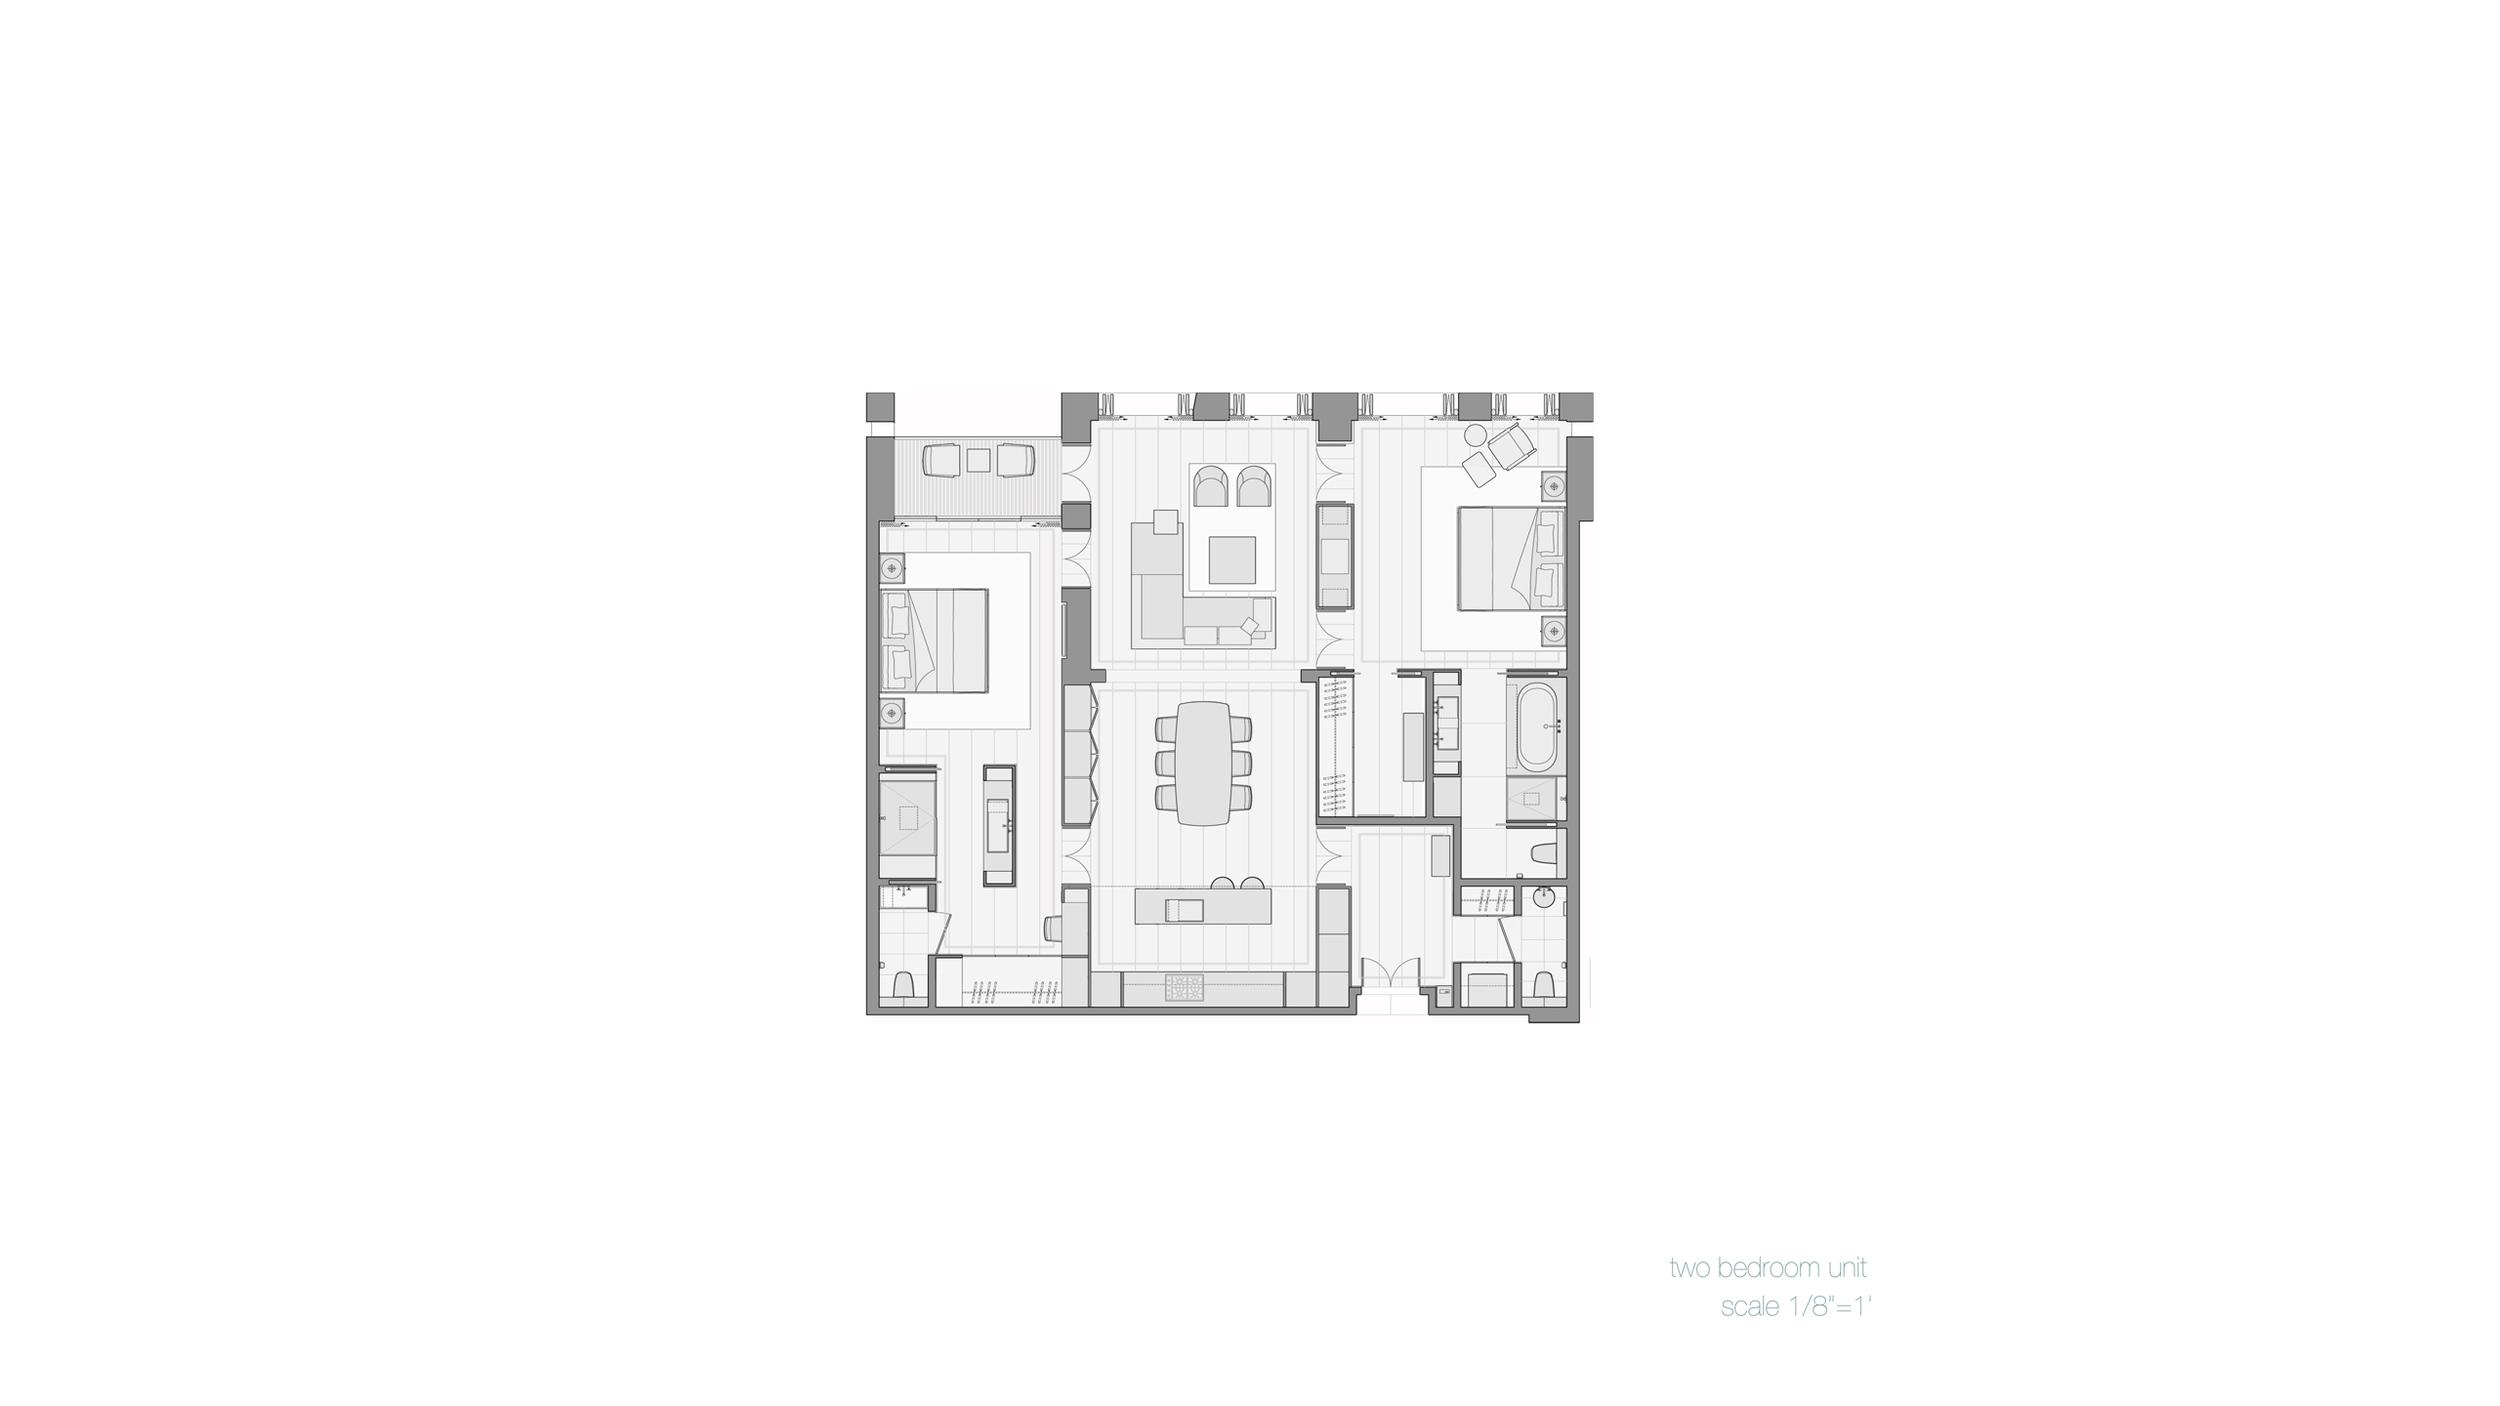 Plan, 2 Bedroom Unit